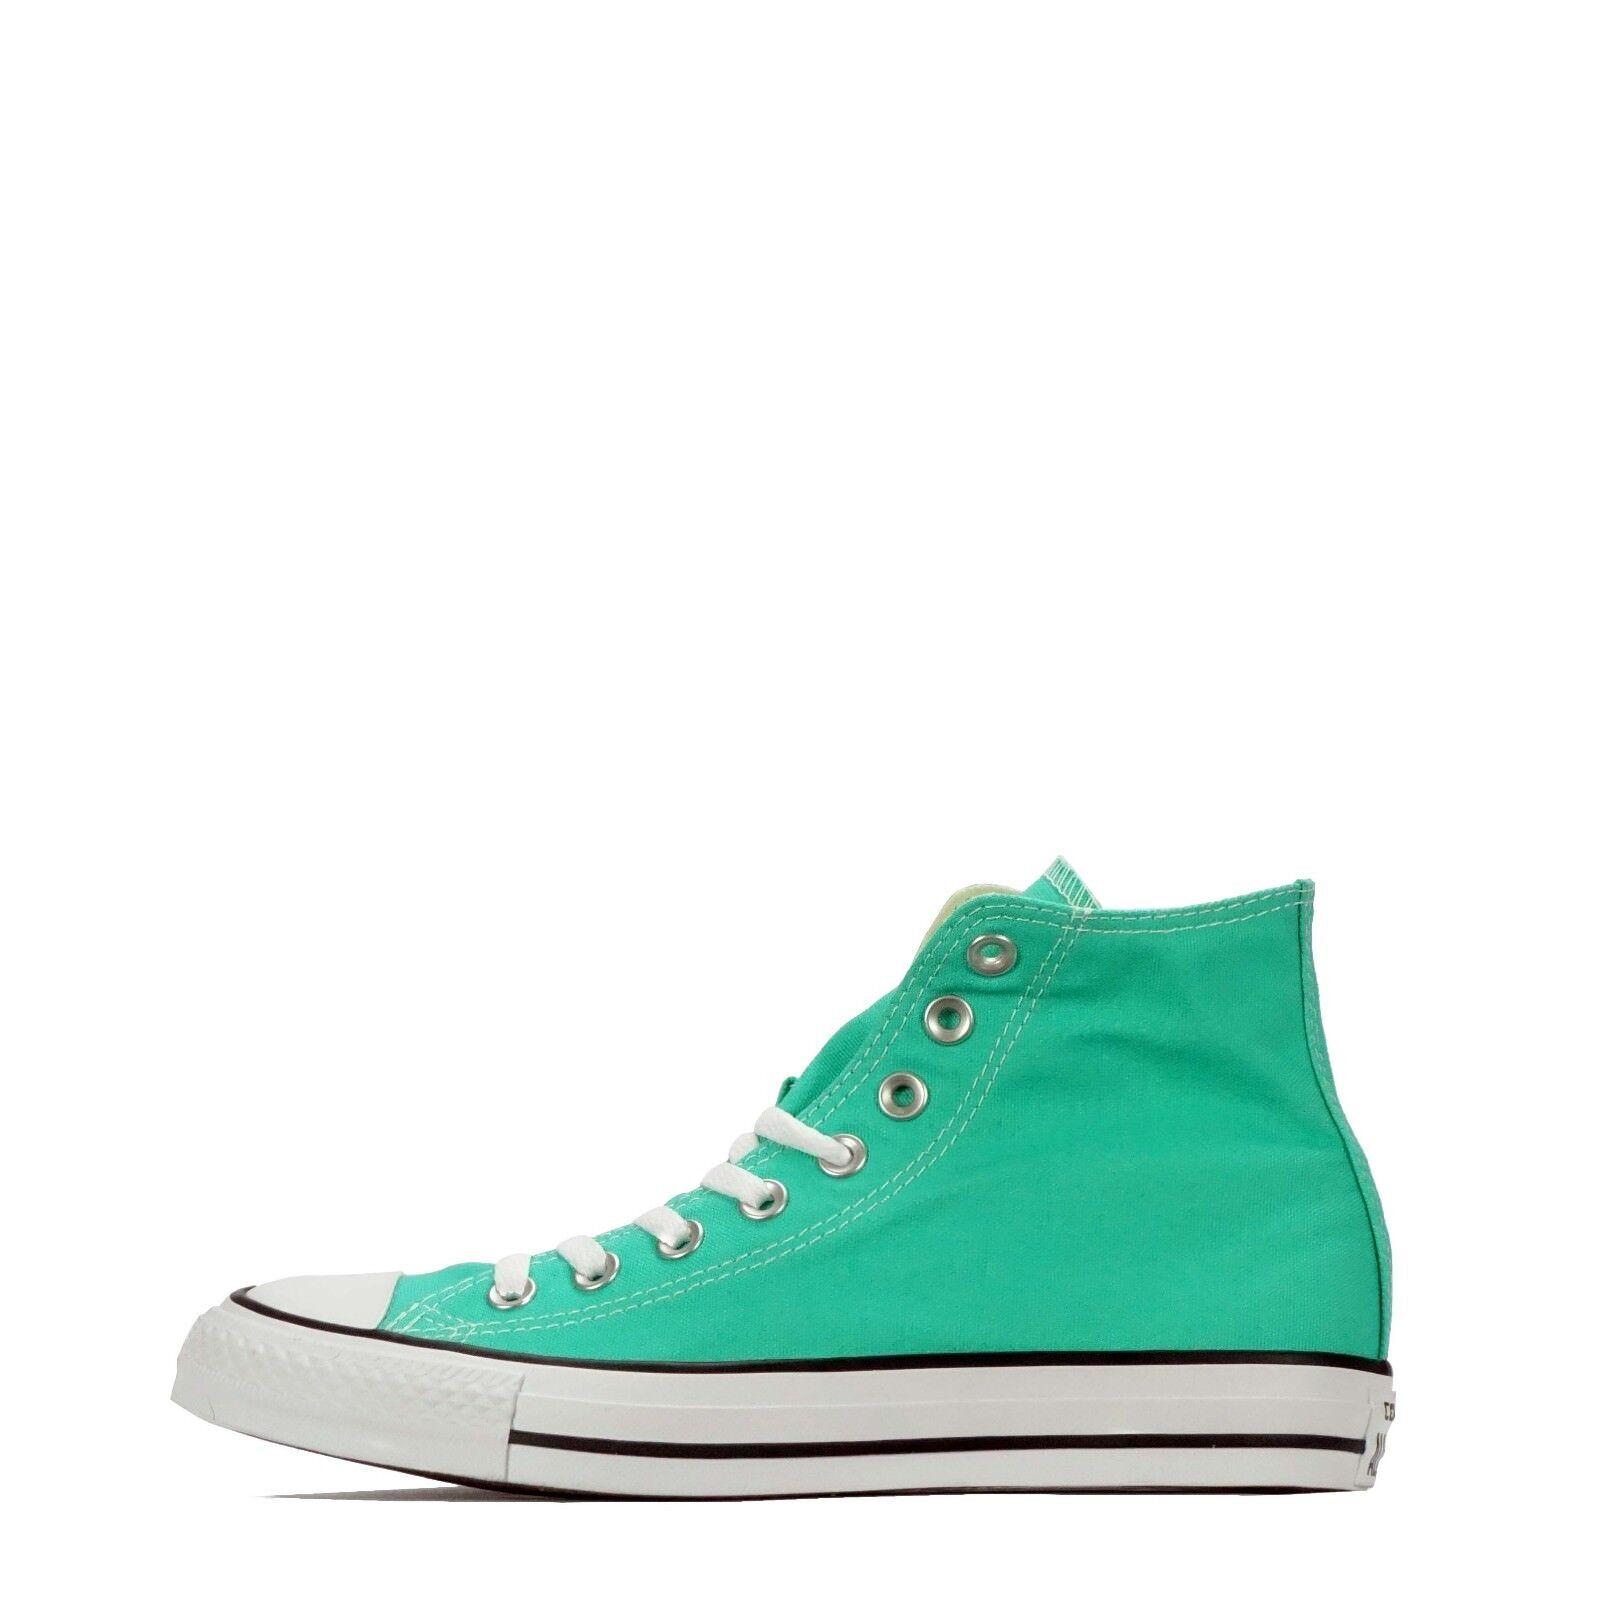 5529c2bdb274 Converse Unisex Shoes Chuck Taylor All Star Sneaker Hi Menta (green ...